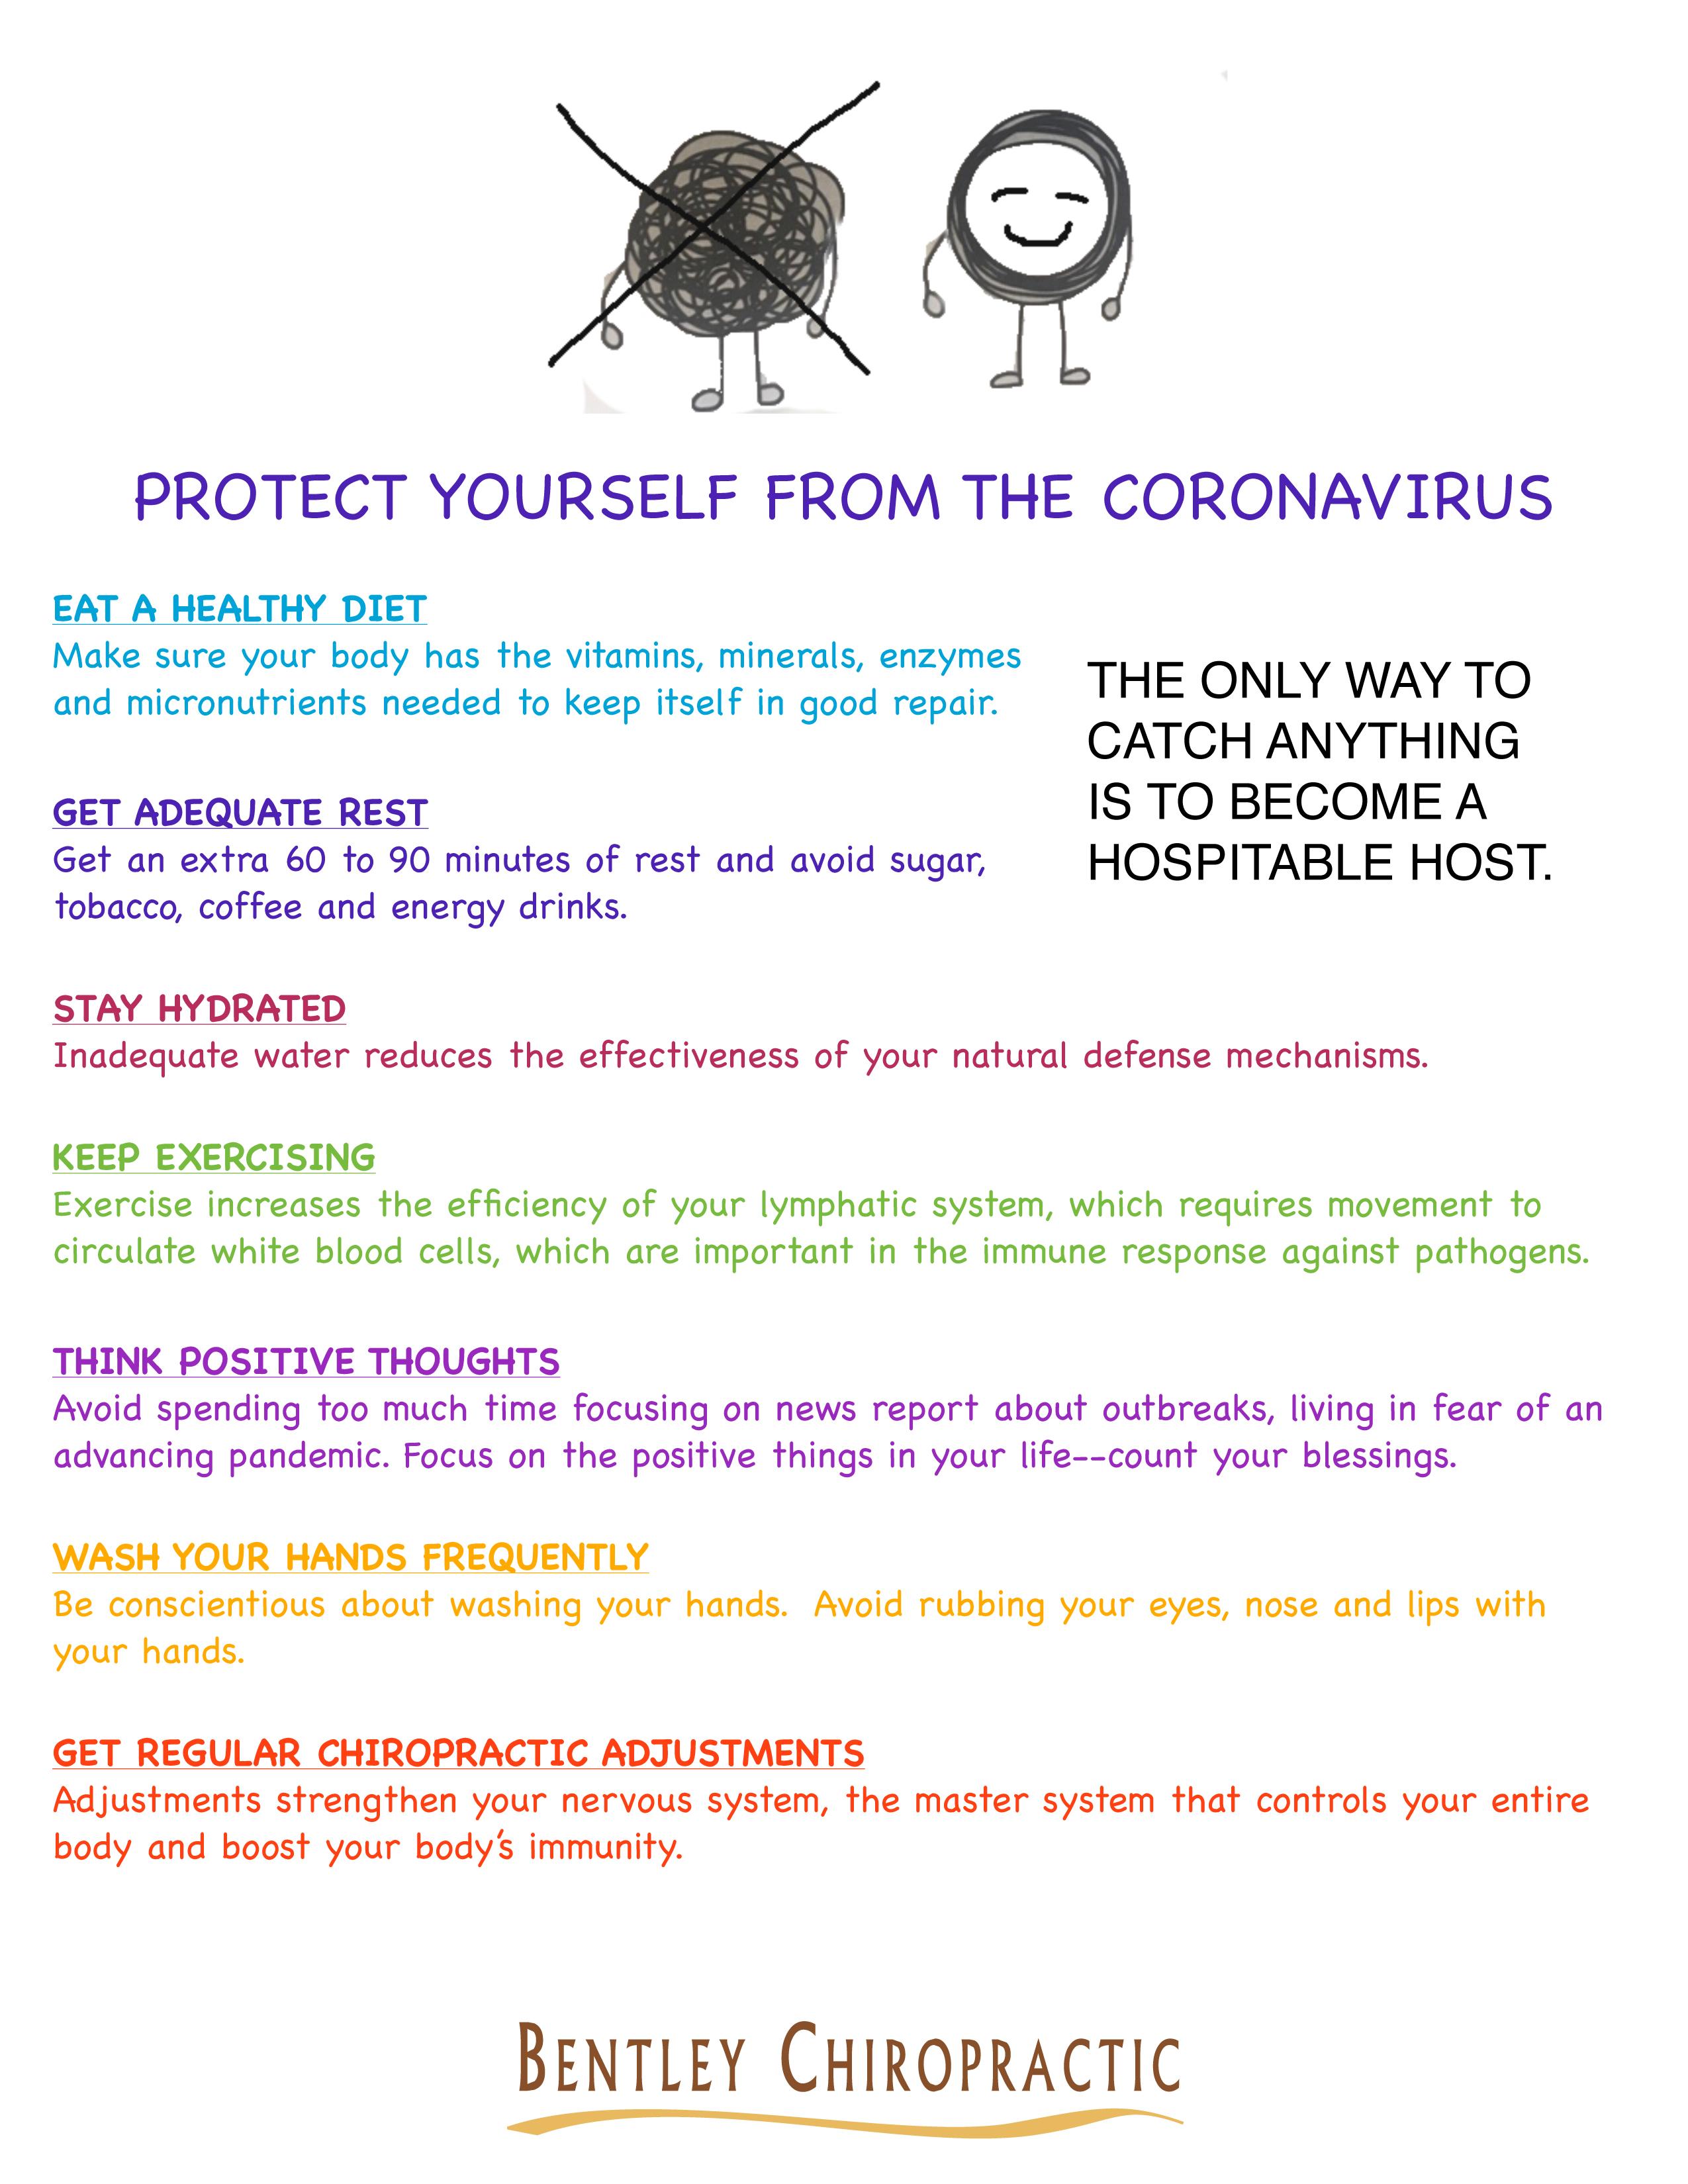 Corona virus handout